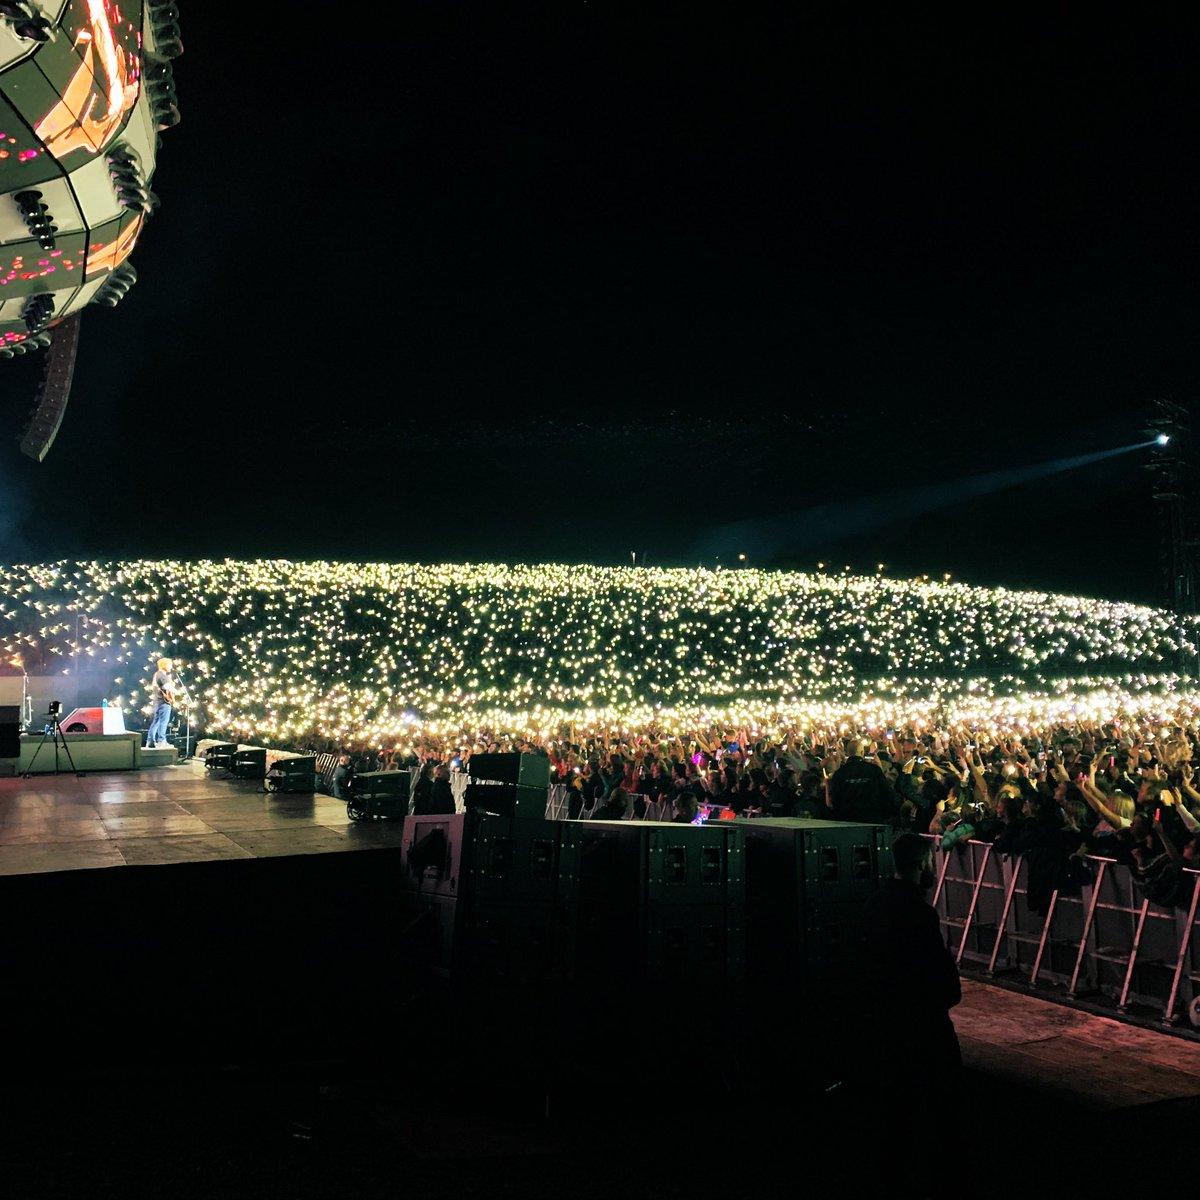 Ed Sheeran. Leeds. Amazing night.